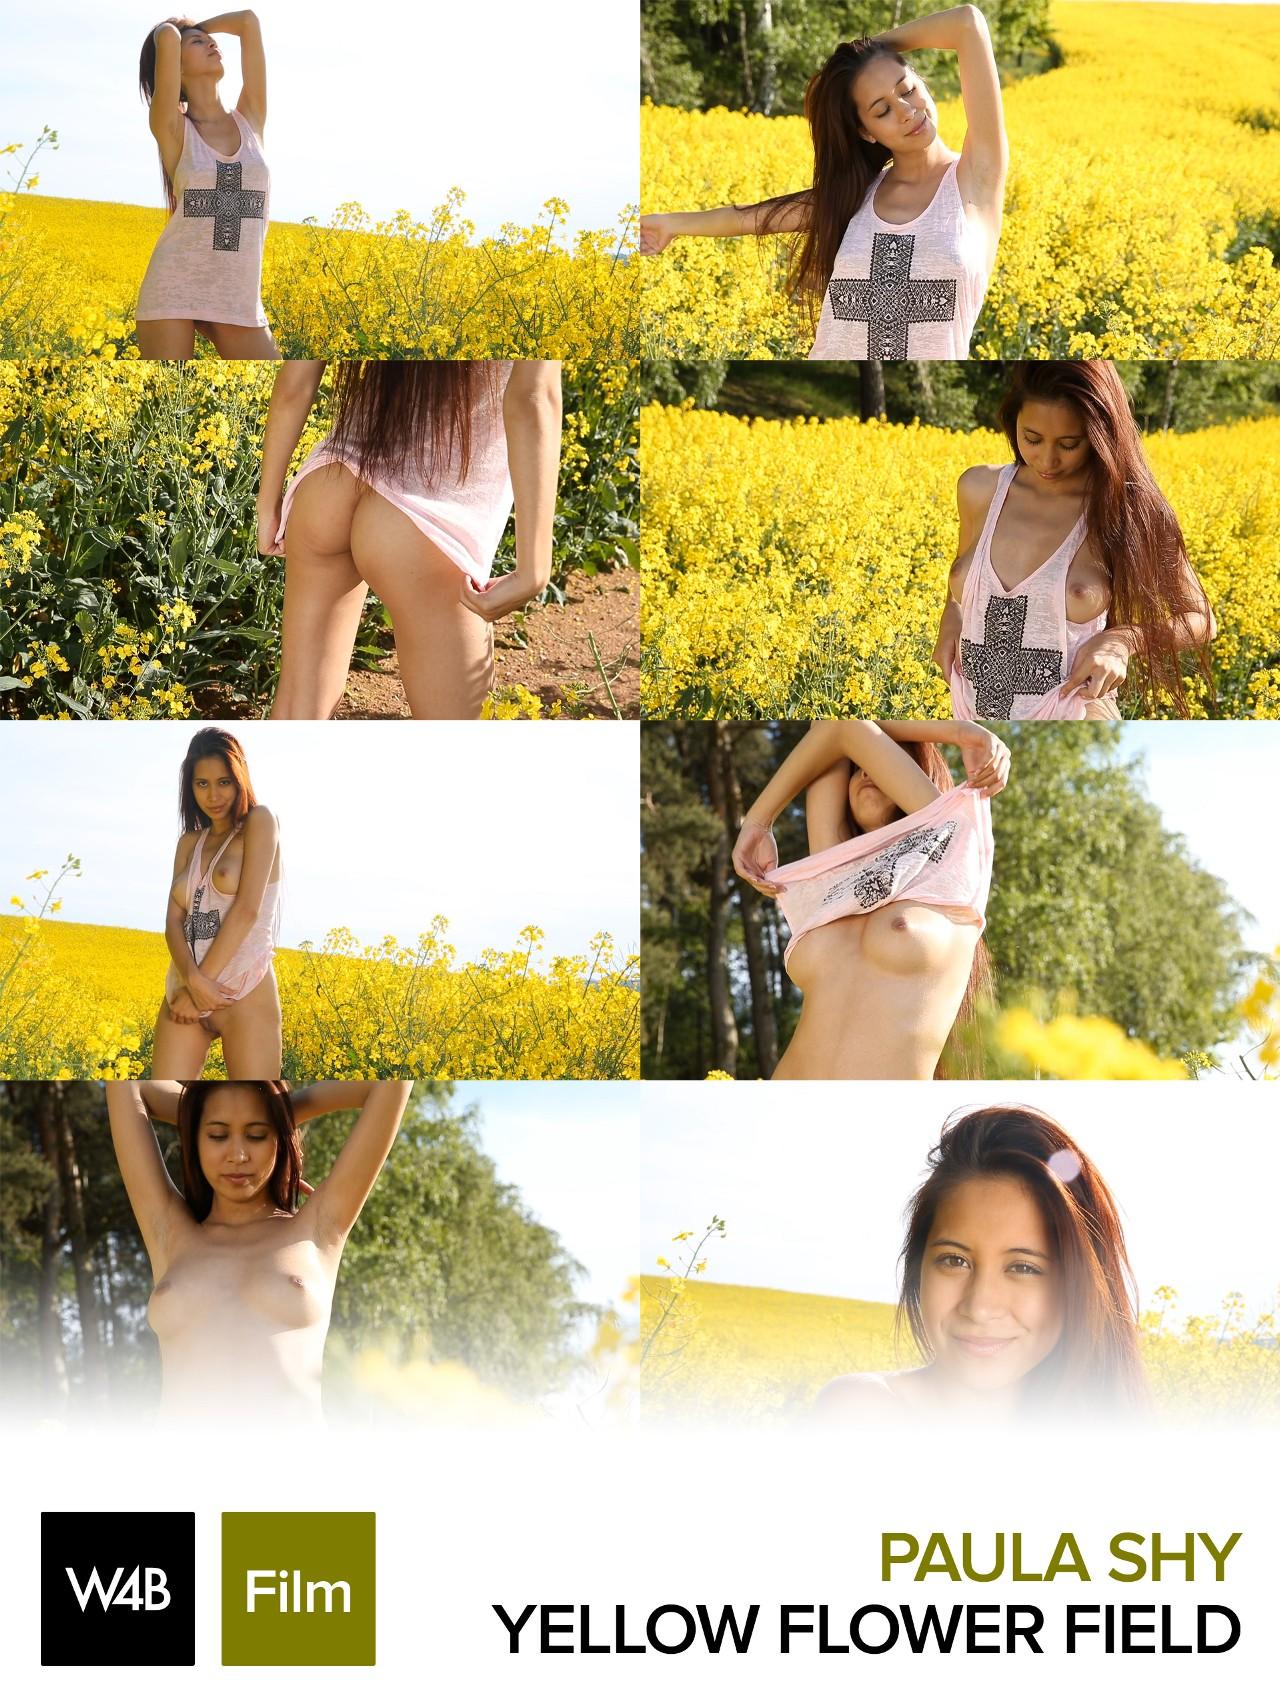 Paula Shy: Yellow flower field